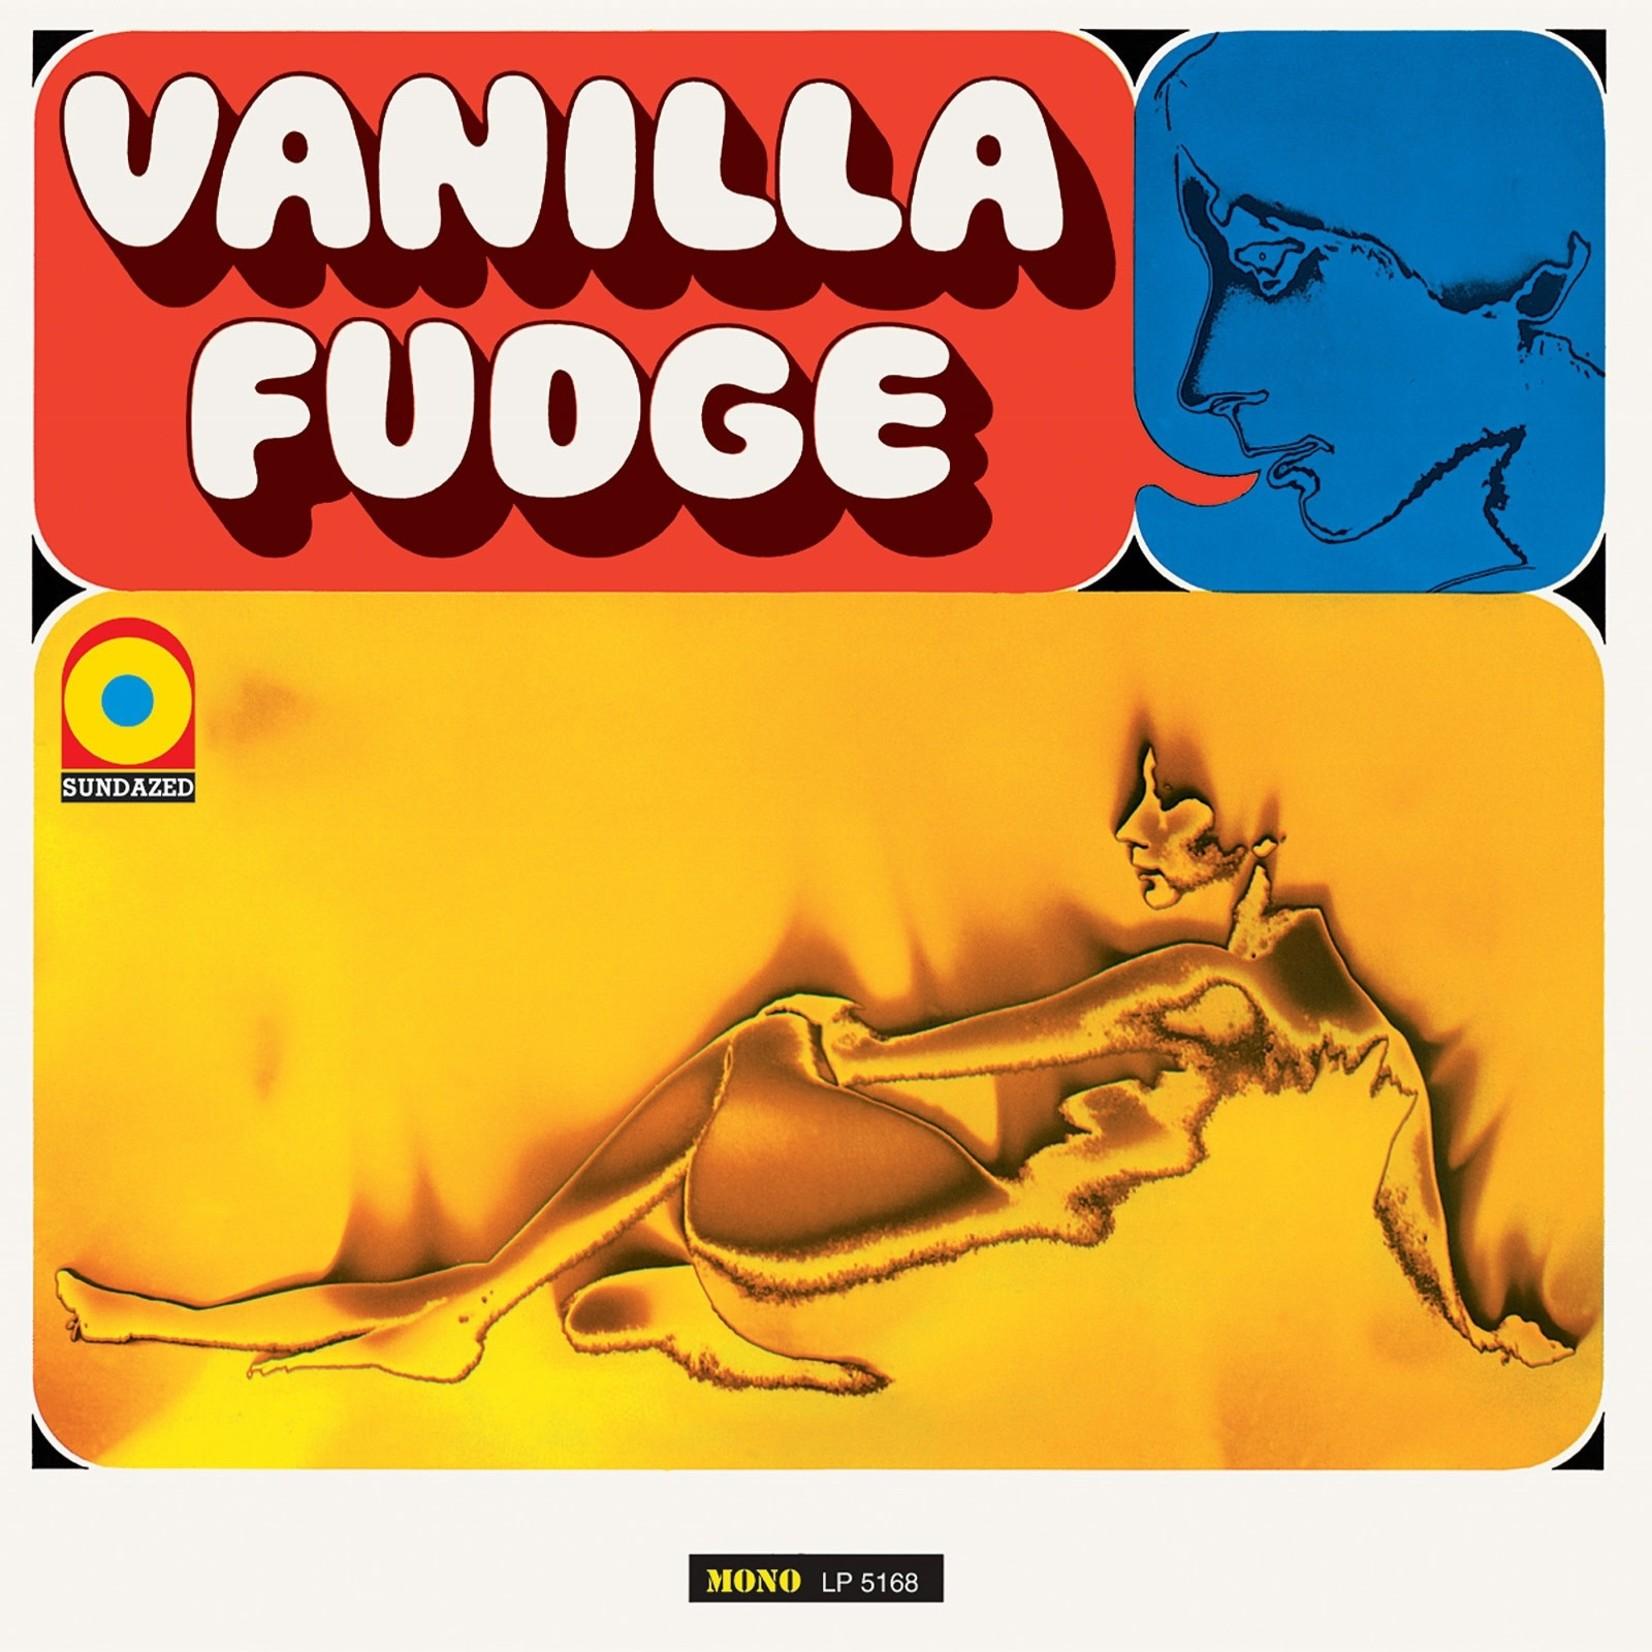 [New] Vanilla Fudge: Vanilla Fudge (mono mix)